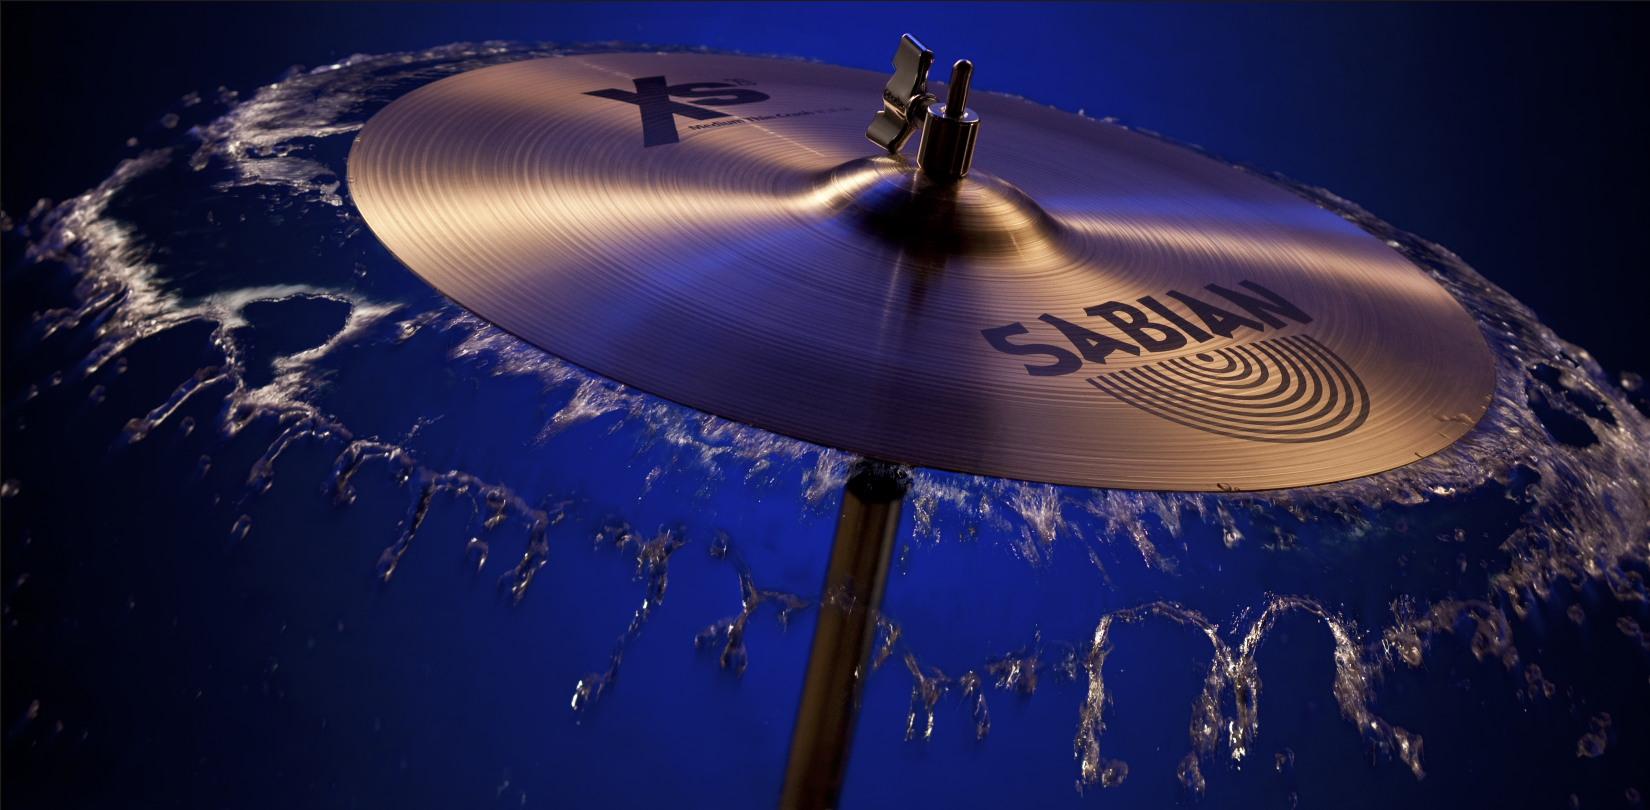 16x20 cymbalrs.JPG